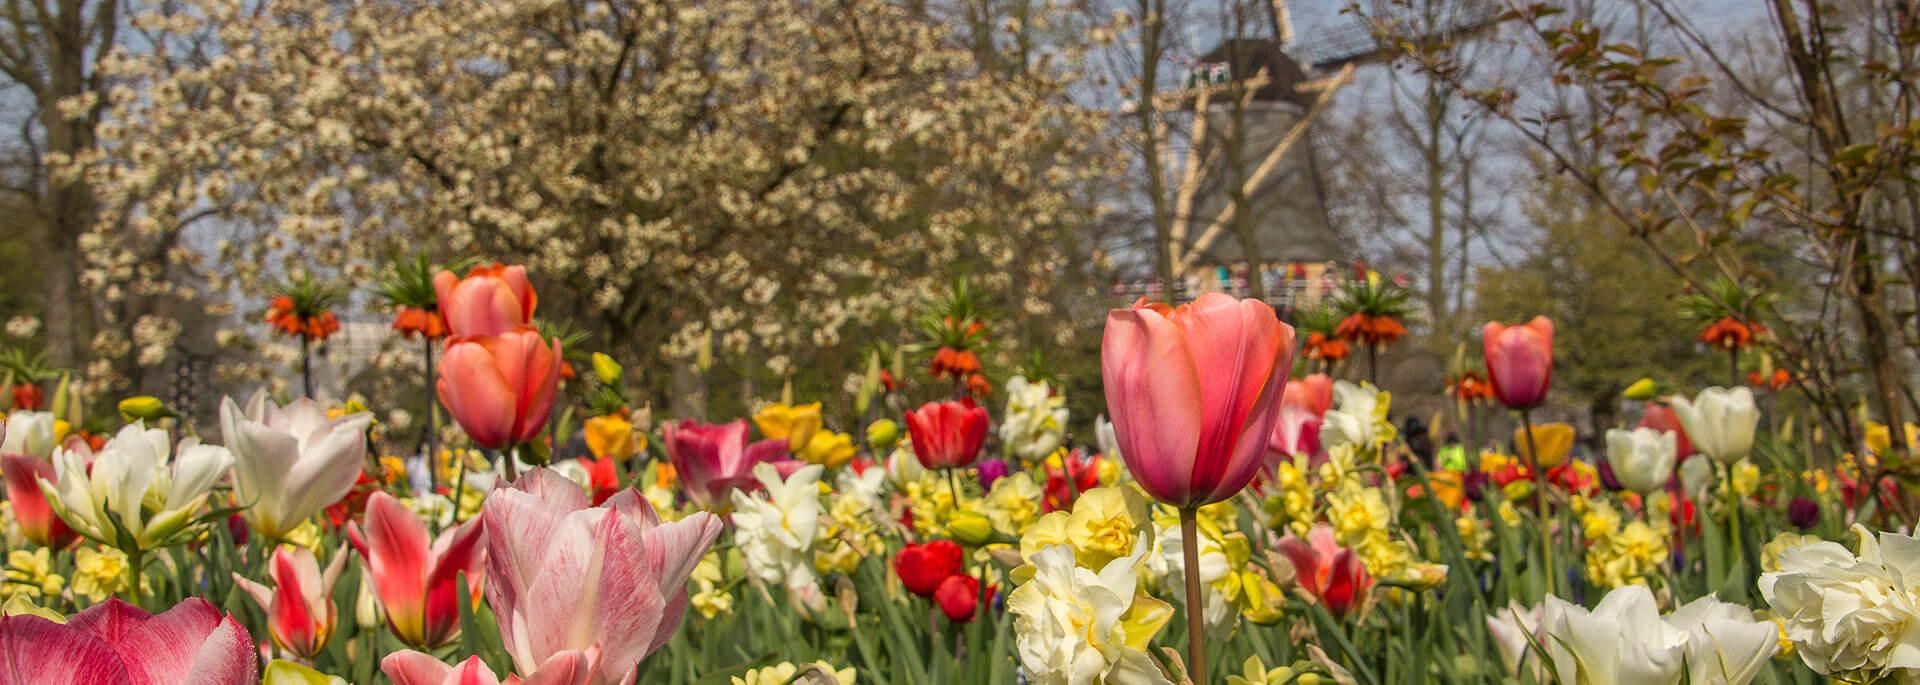 Reisetipp Holland: Im Keukenhof in Tulpen baden